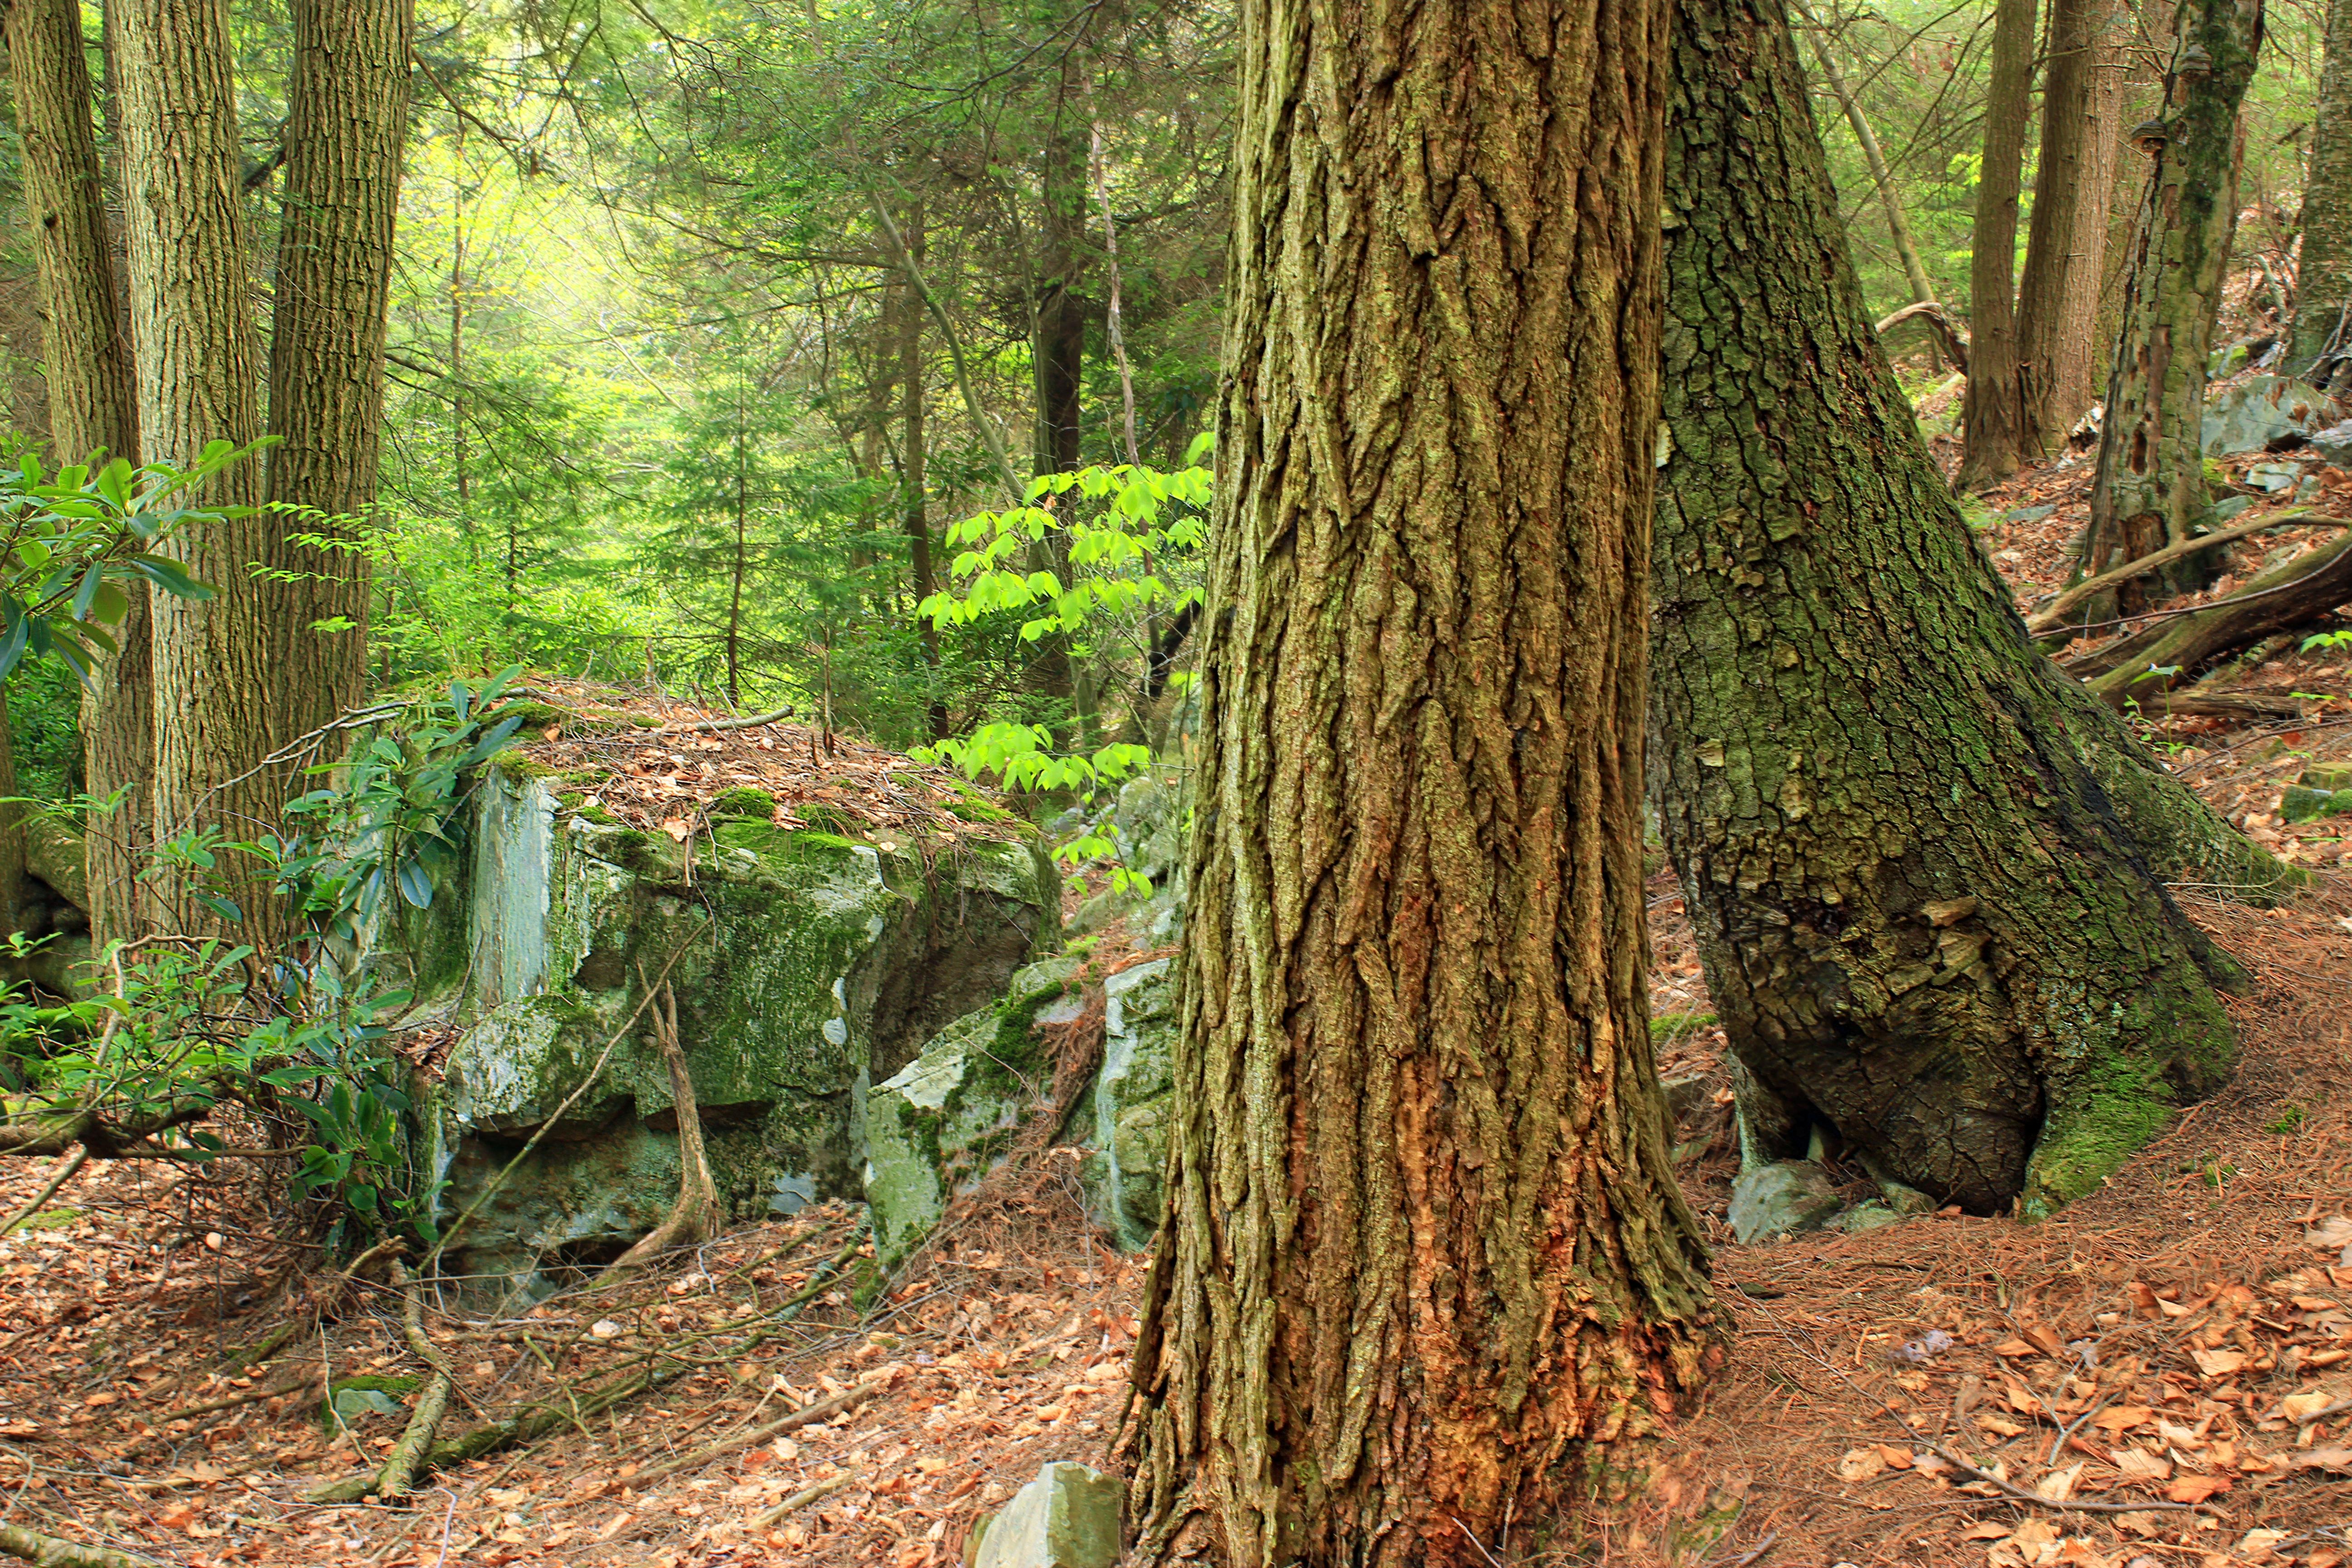 Hypsy Creek (5), Bark, Poconos, Trunks, Trees, HQ Photo